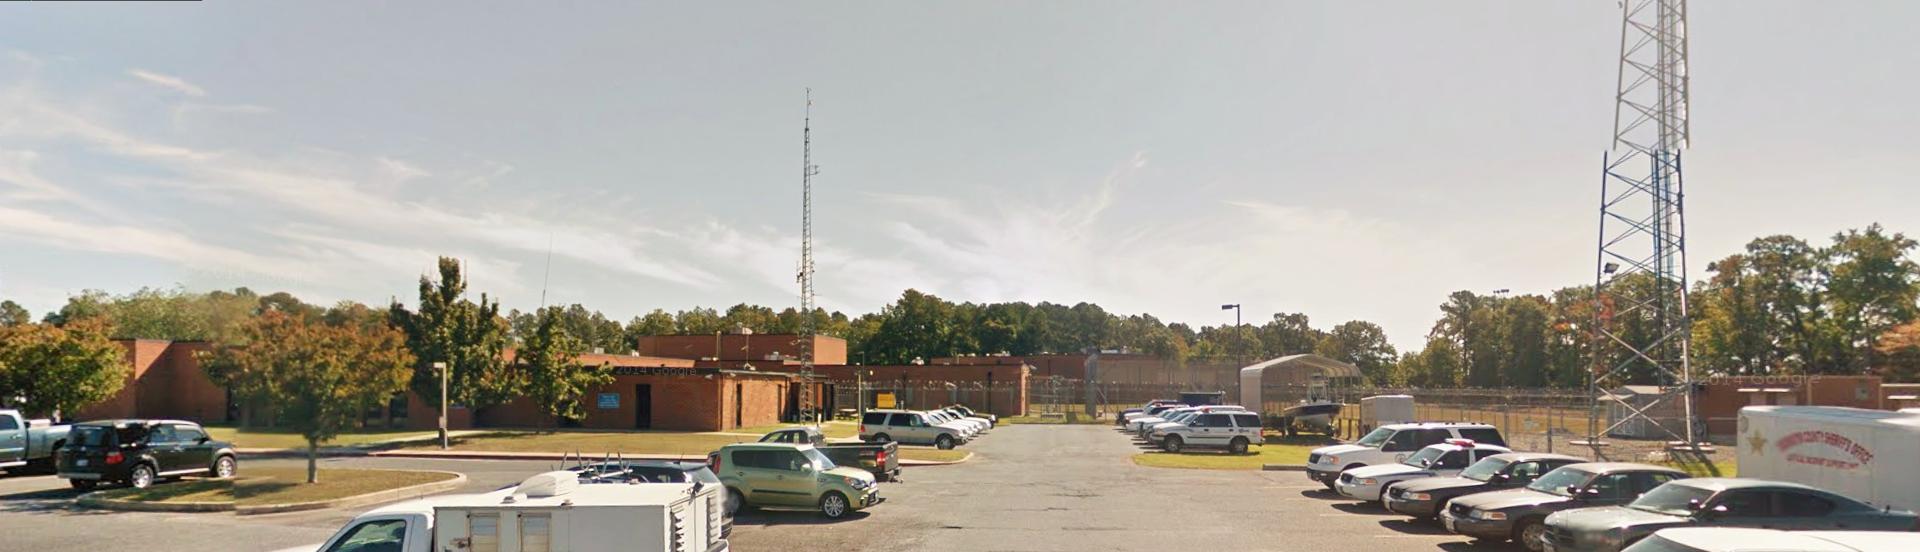 Dorchester County Detention Center (United States of America)